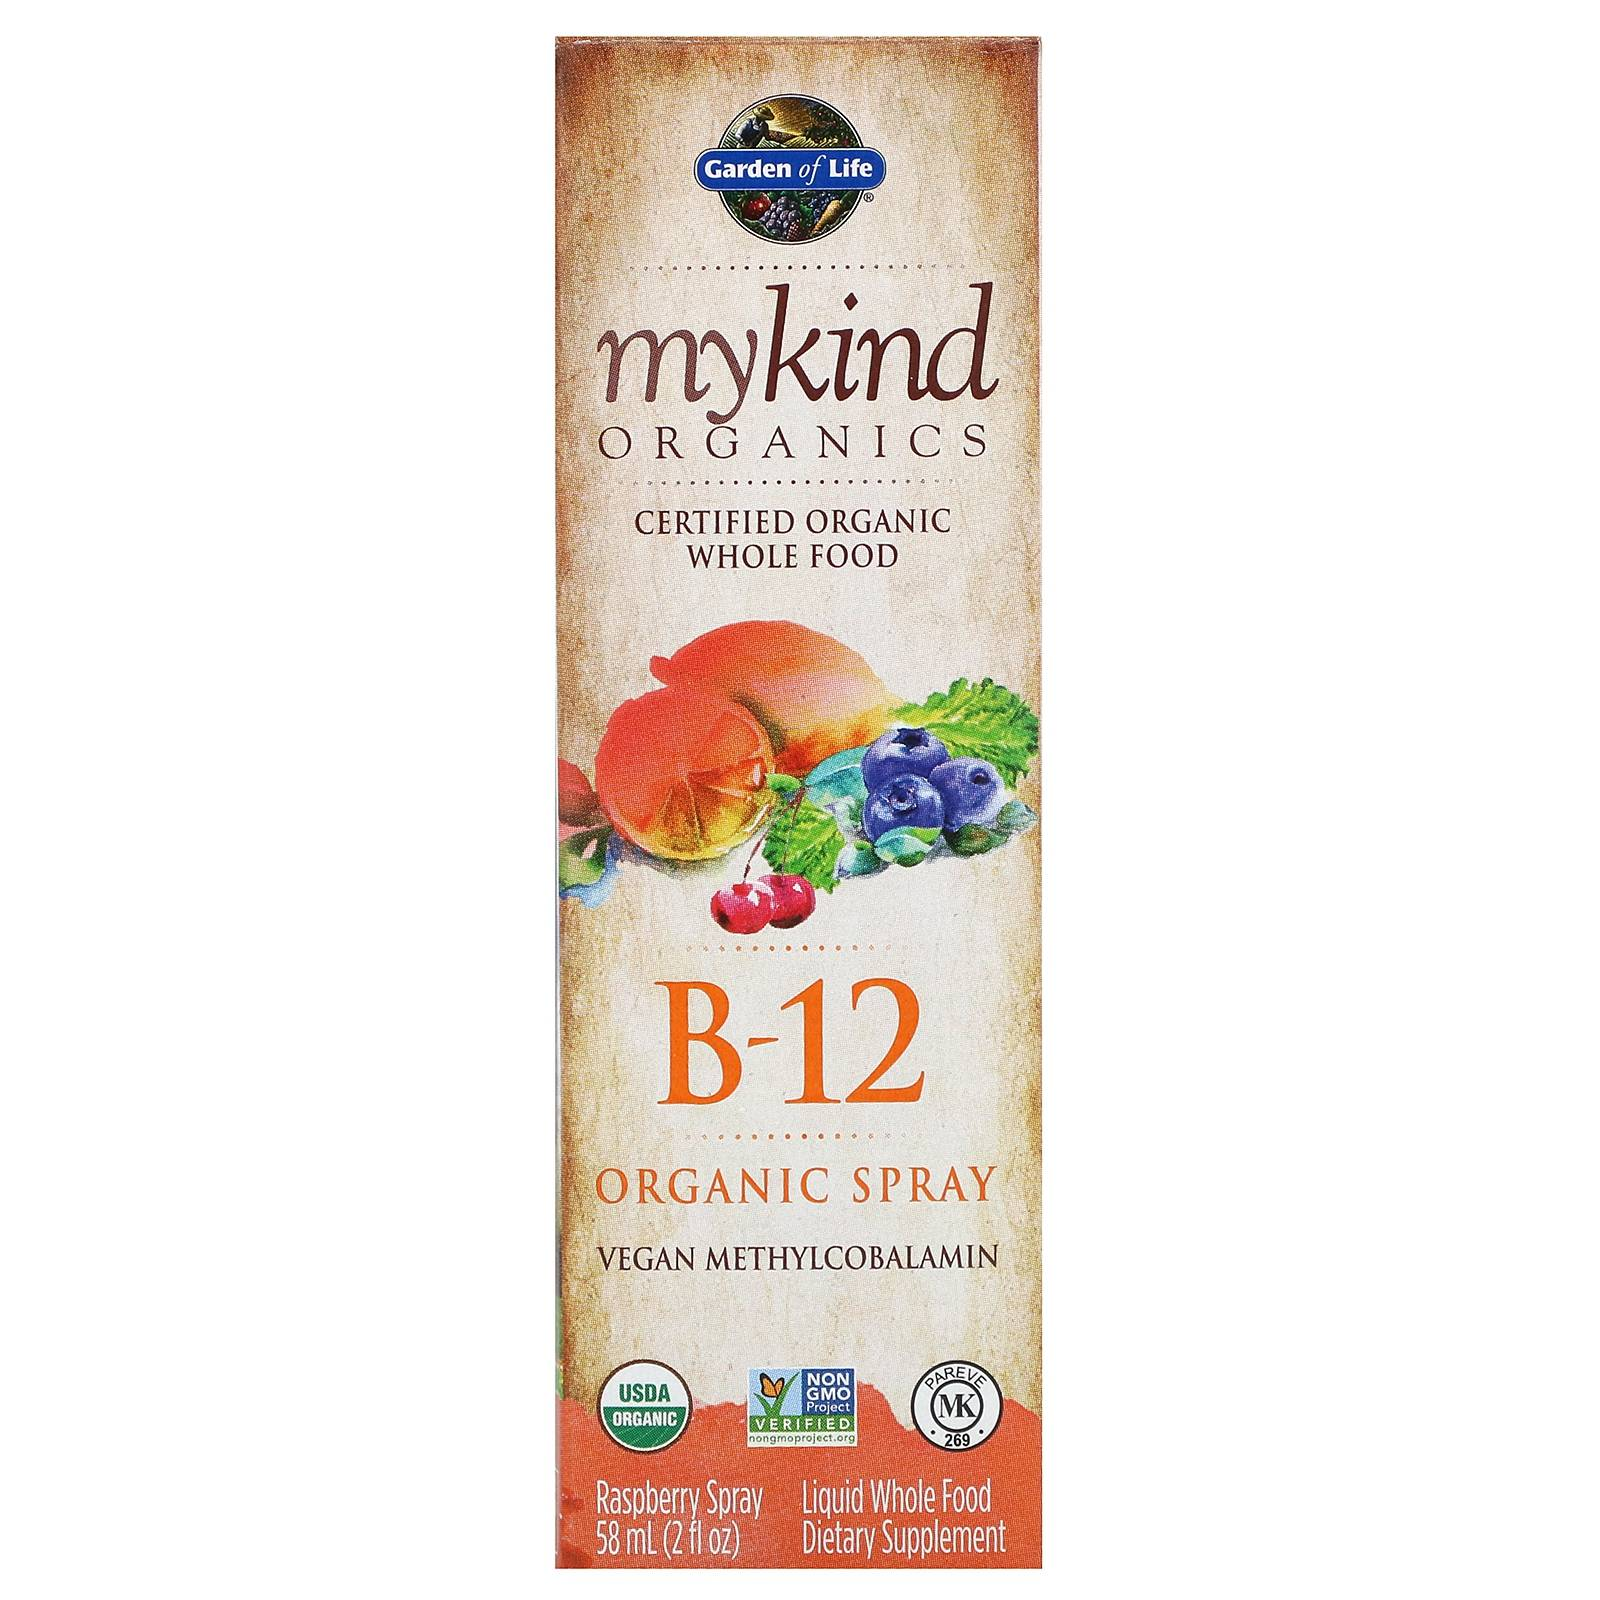 Garden of Life MyKind Organics - B-12 Organic Spray - Raspberry (58 ml) - Garden of Life